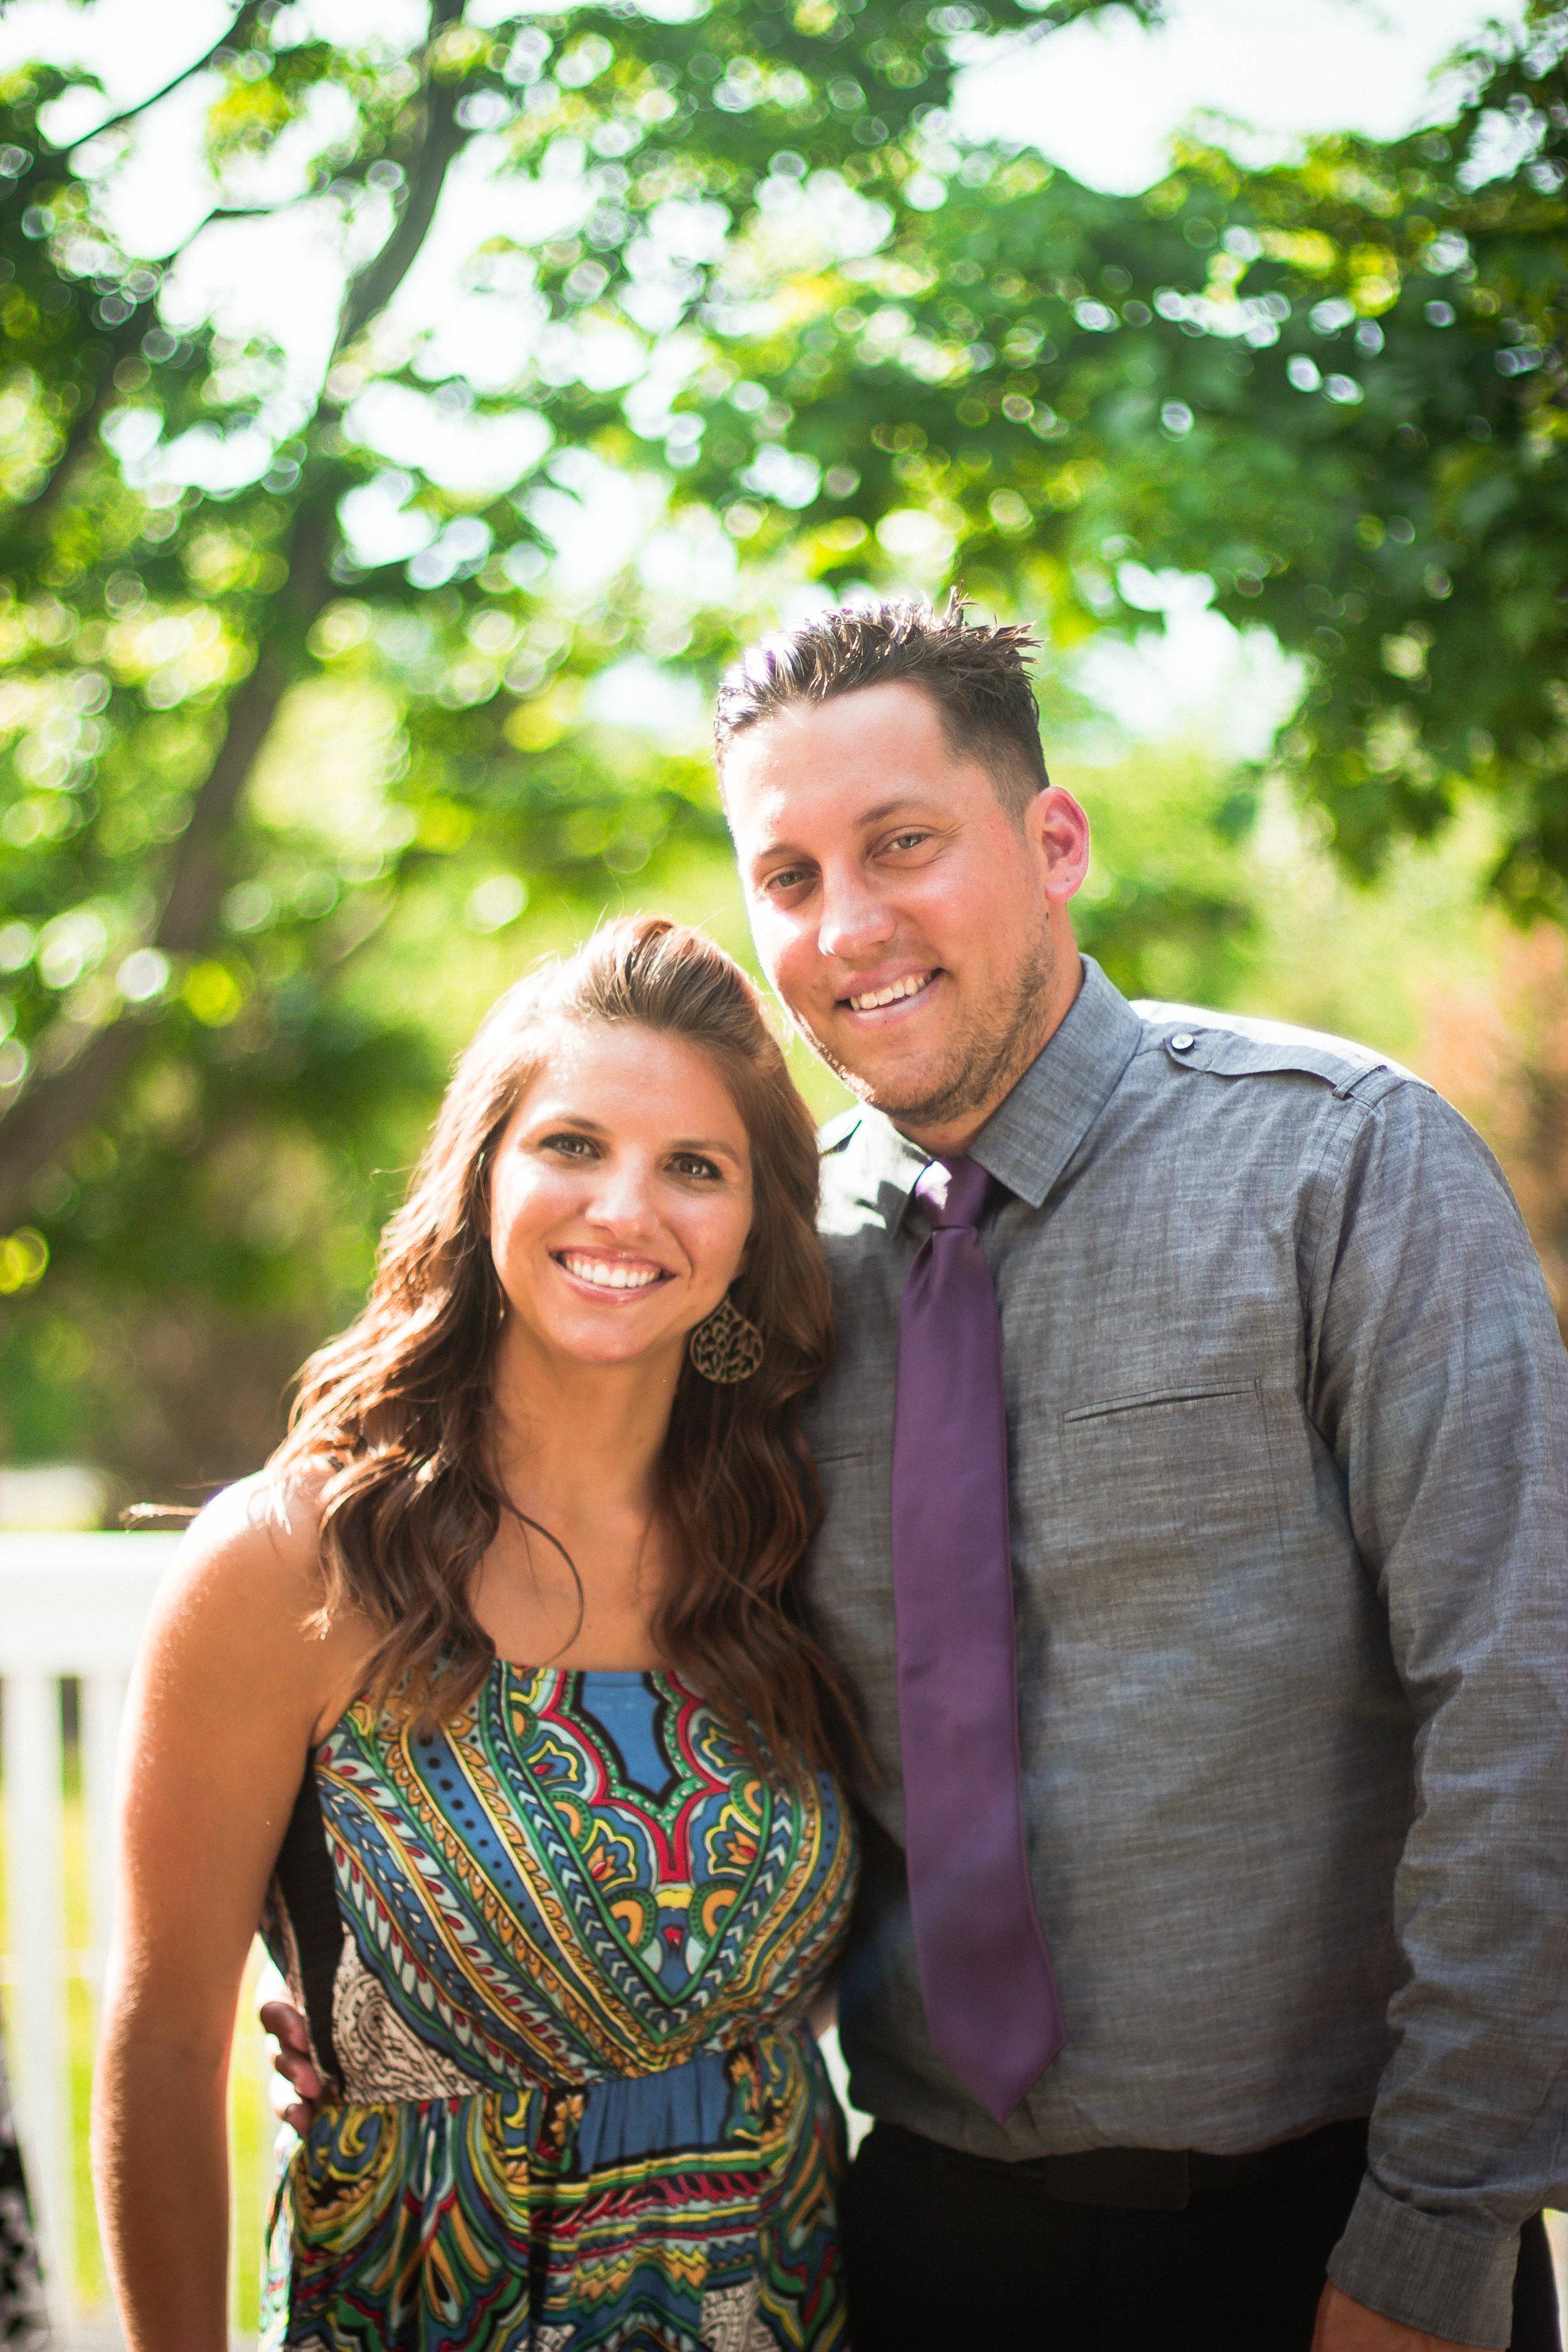 WeddingPortfolio-8.jpg